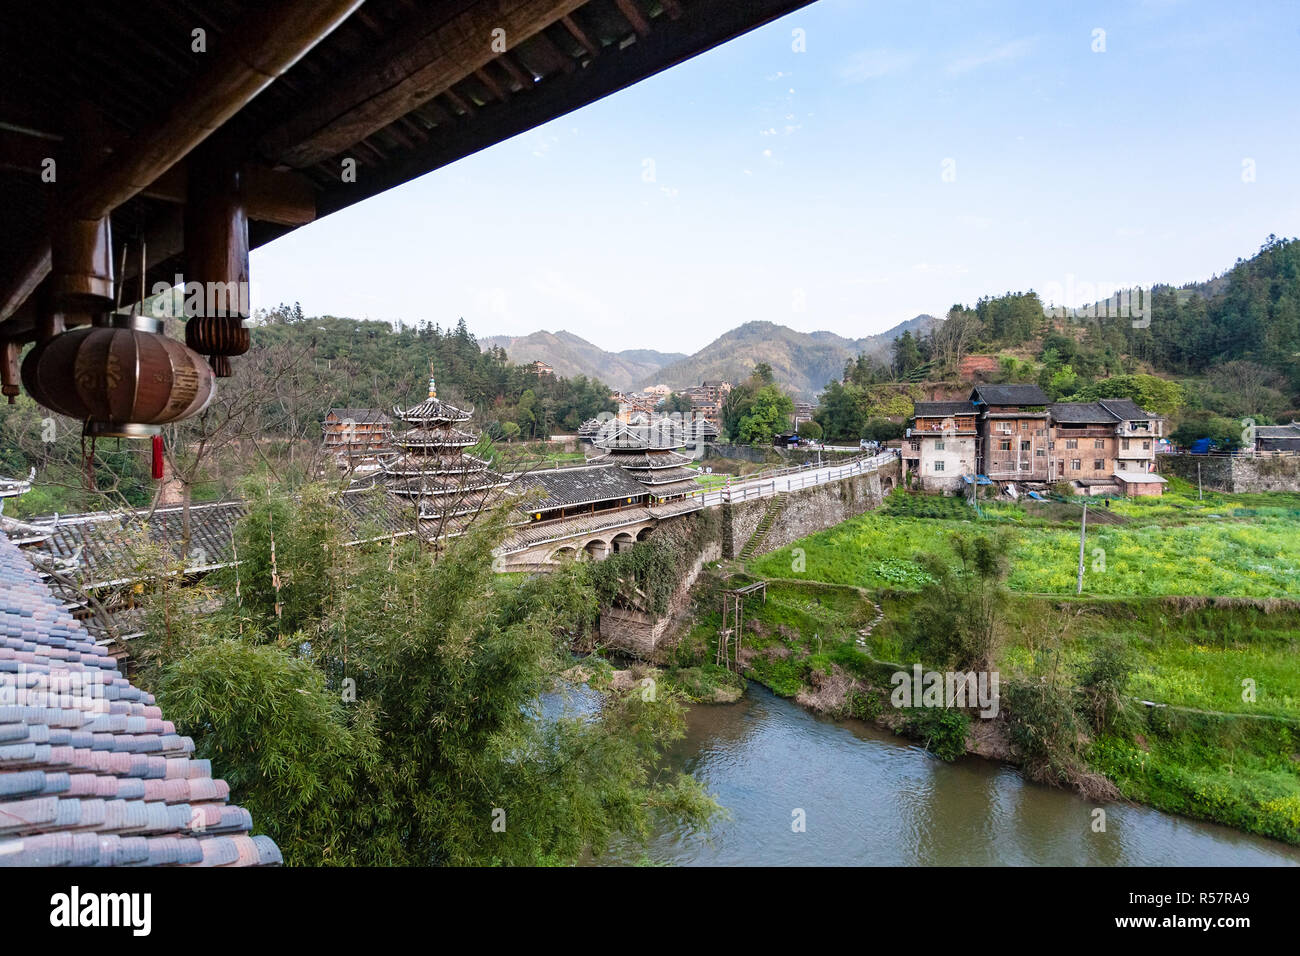 view of Chengyang Wind and Rain Bridge and gardens - Stock Image